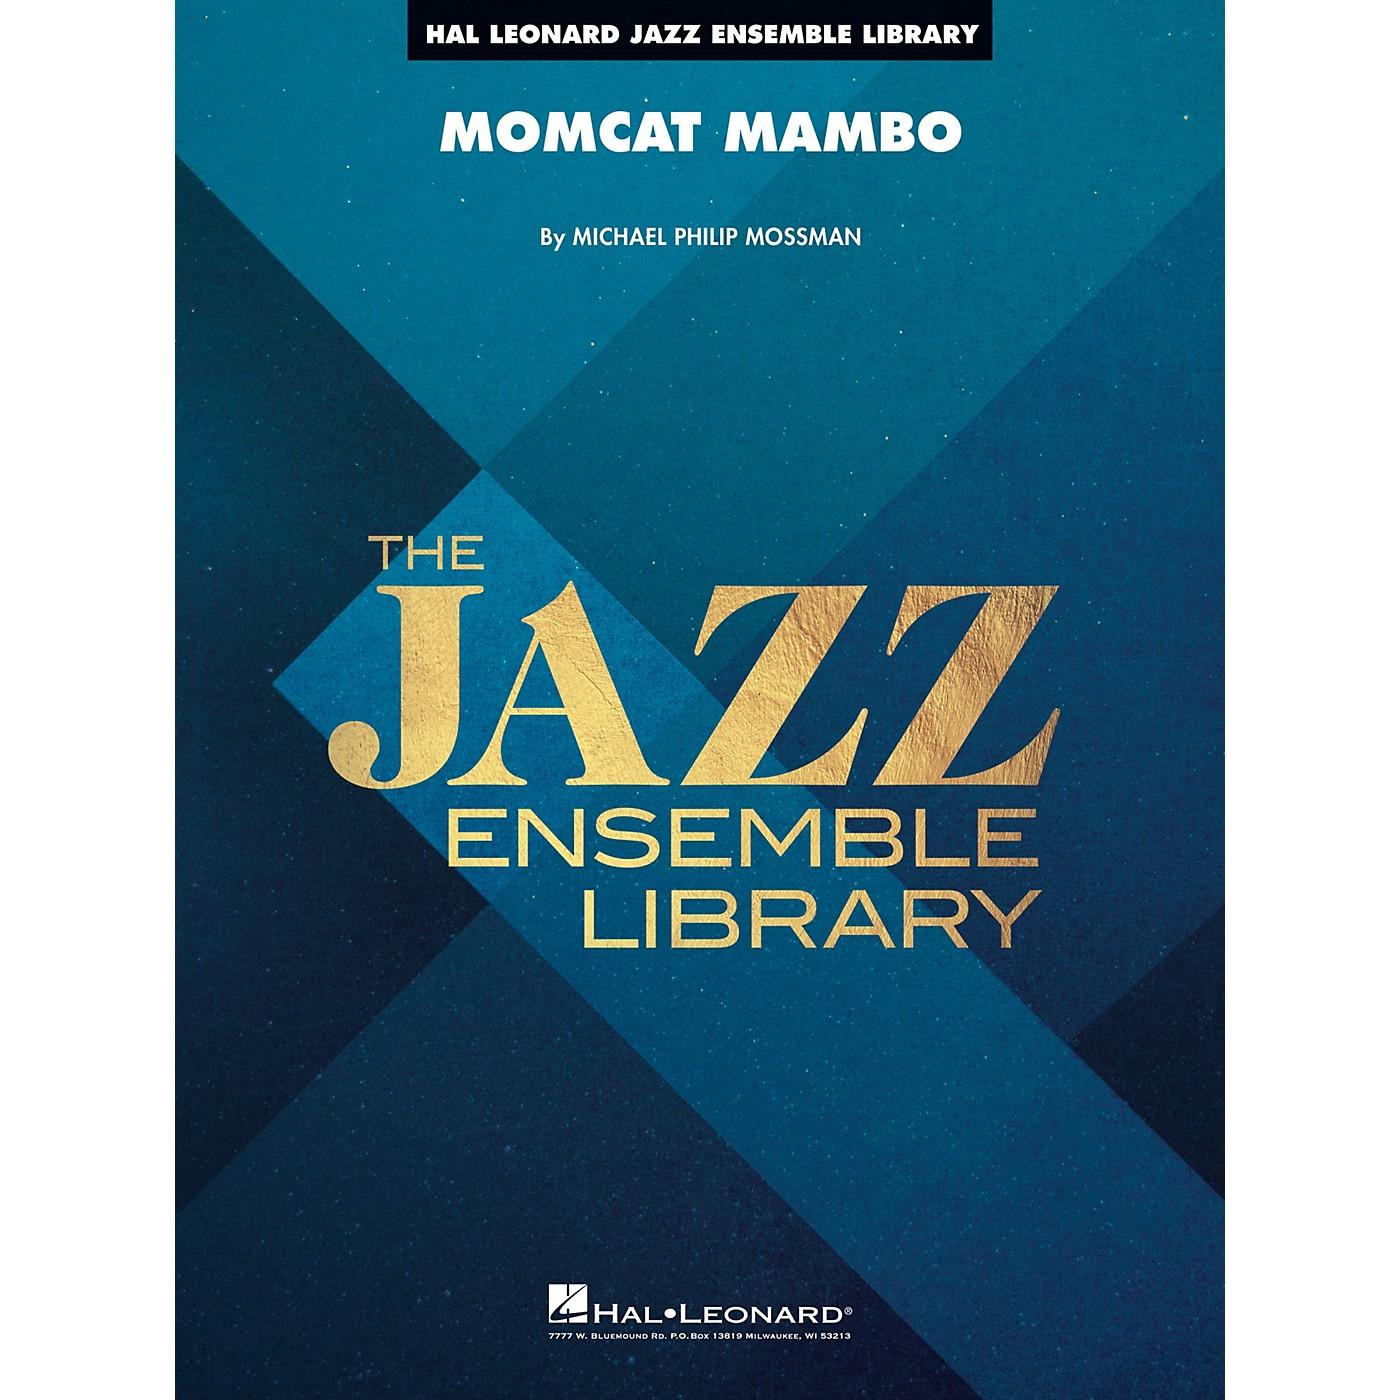 Hal Leonard Momcat Mambo Jazz Band Level 4 Composed by Michael Philip Mossman thumbnail